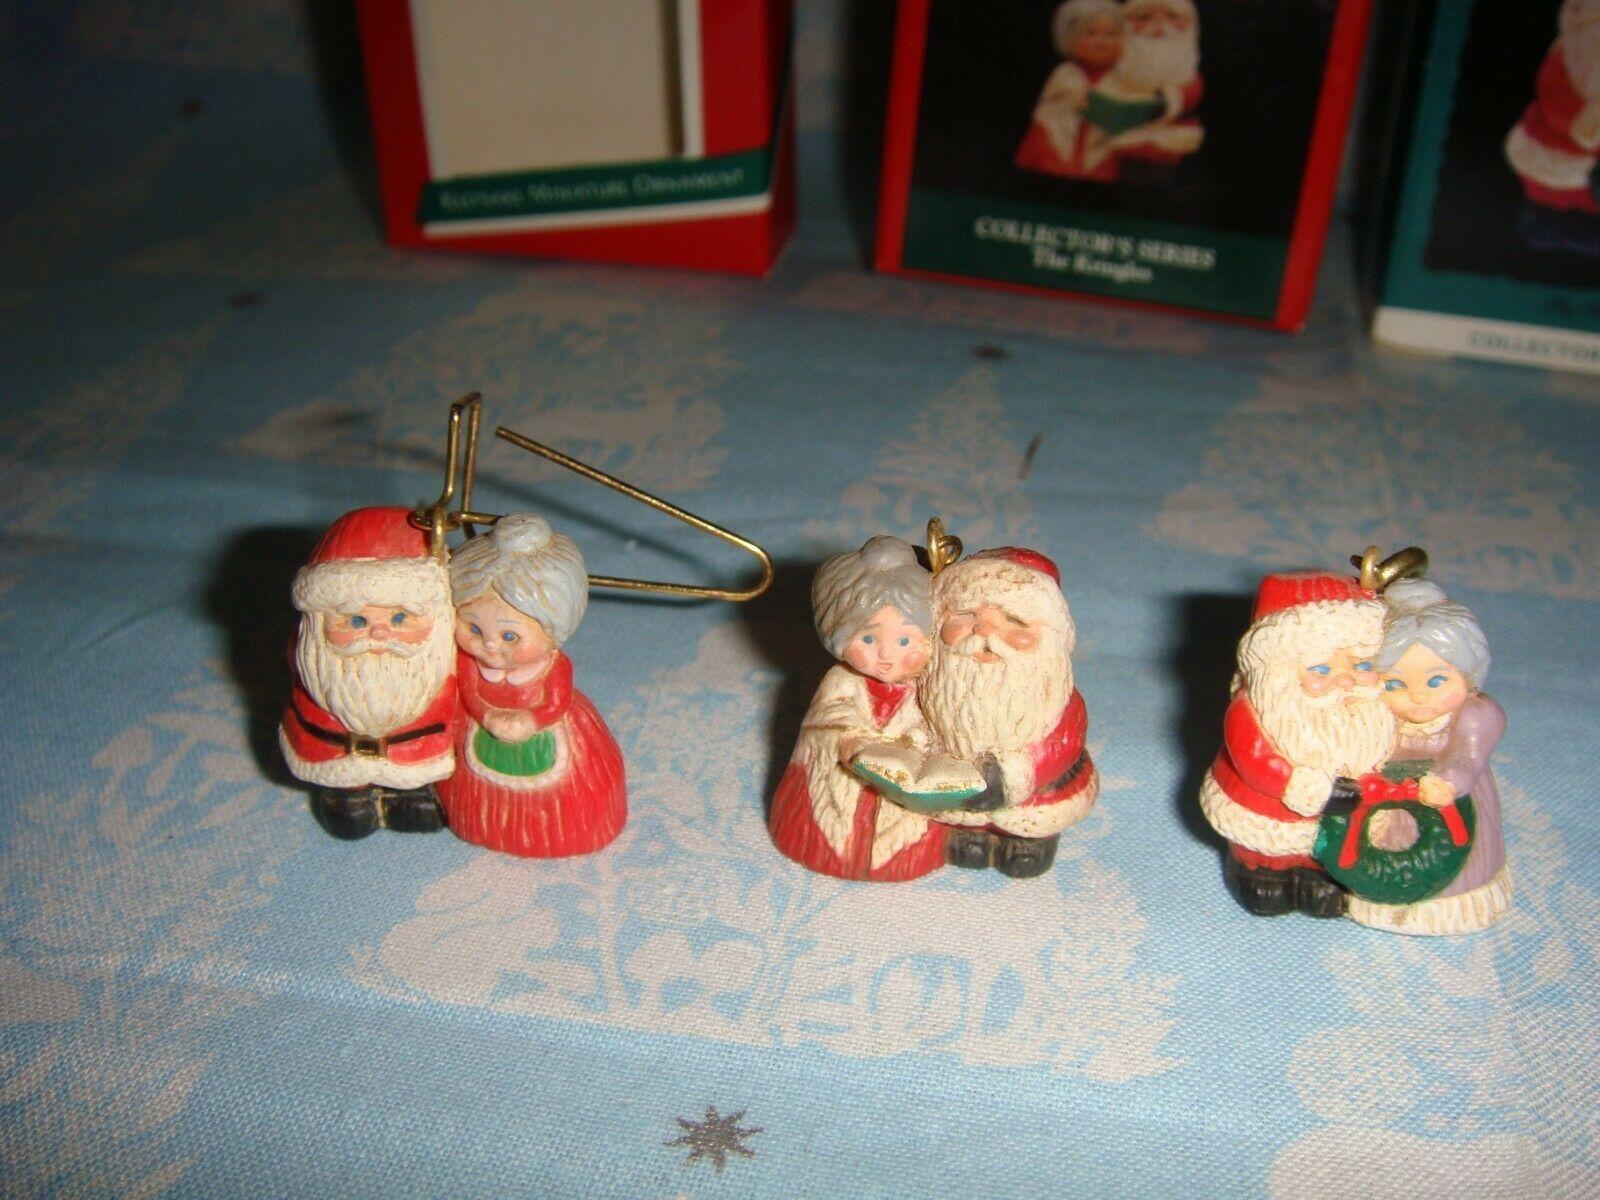 Hallmark Miniature The Kringles 1989, 1992 & 1993 Lot Of 3 Series Ornaments image 4